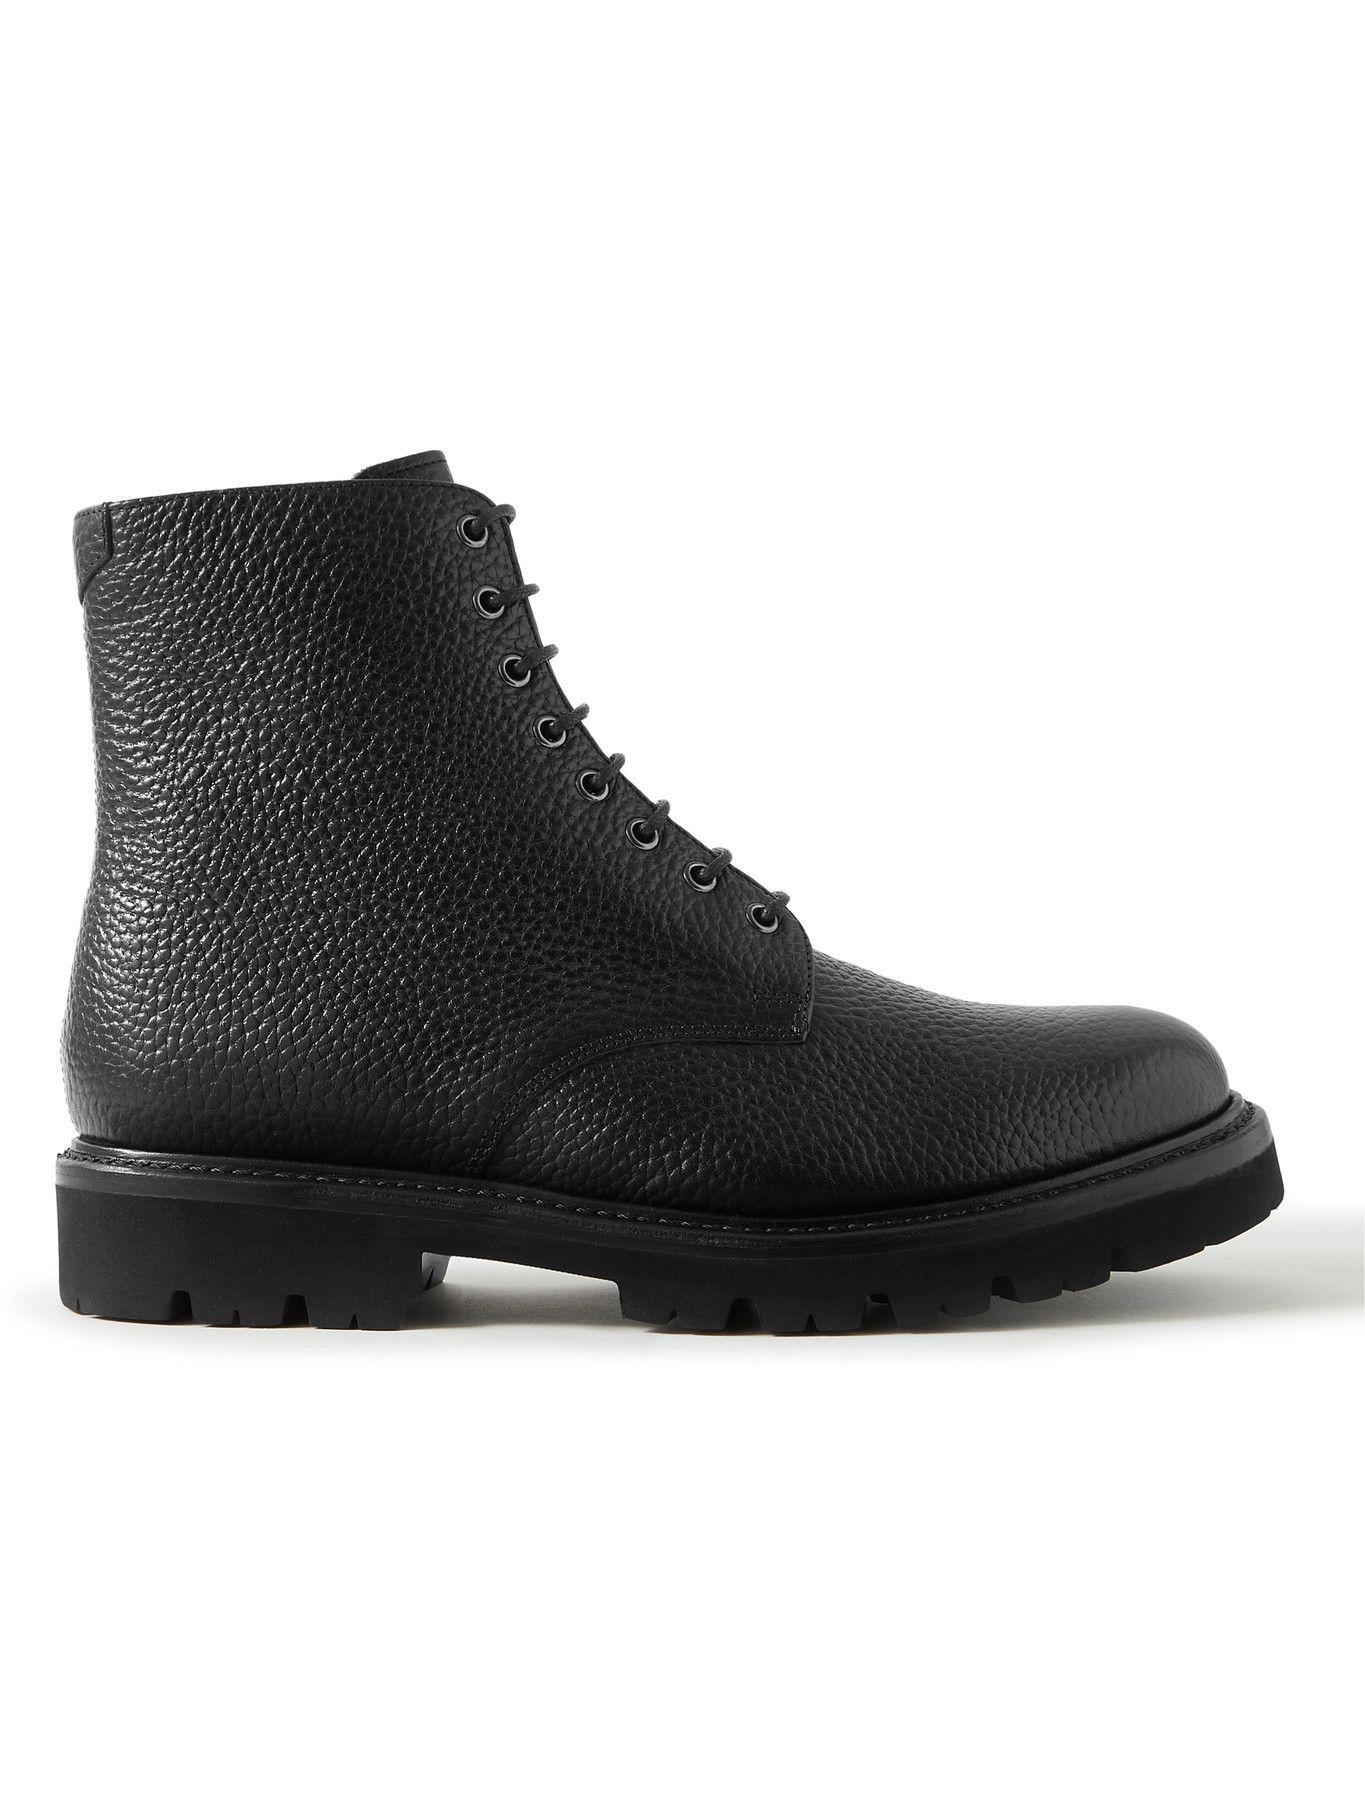 Photo: Grenson - Hadley Full-Grain Leather Boots - Black